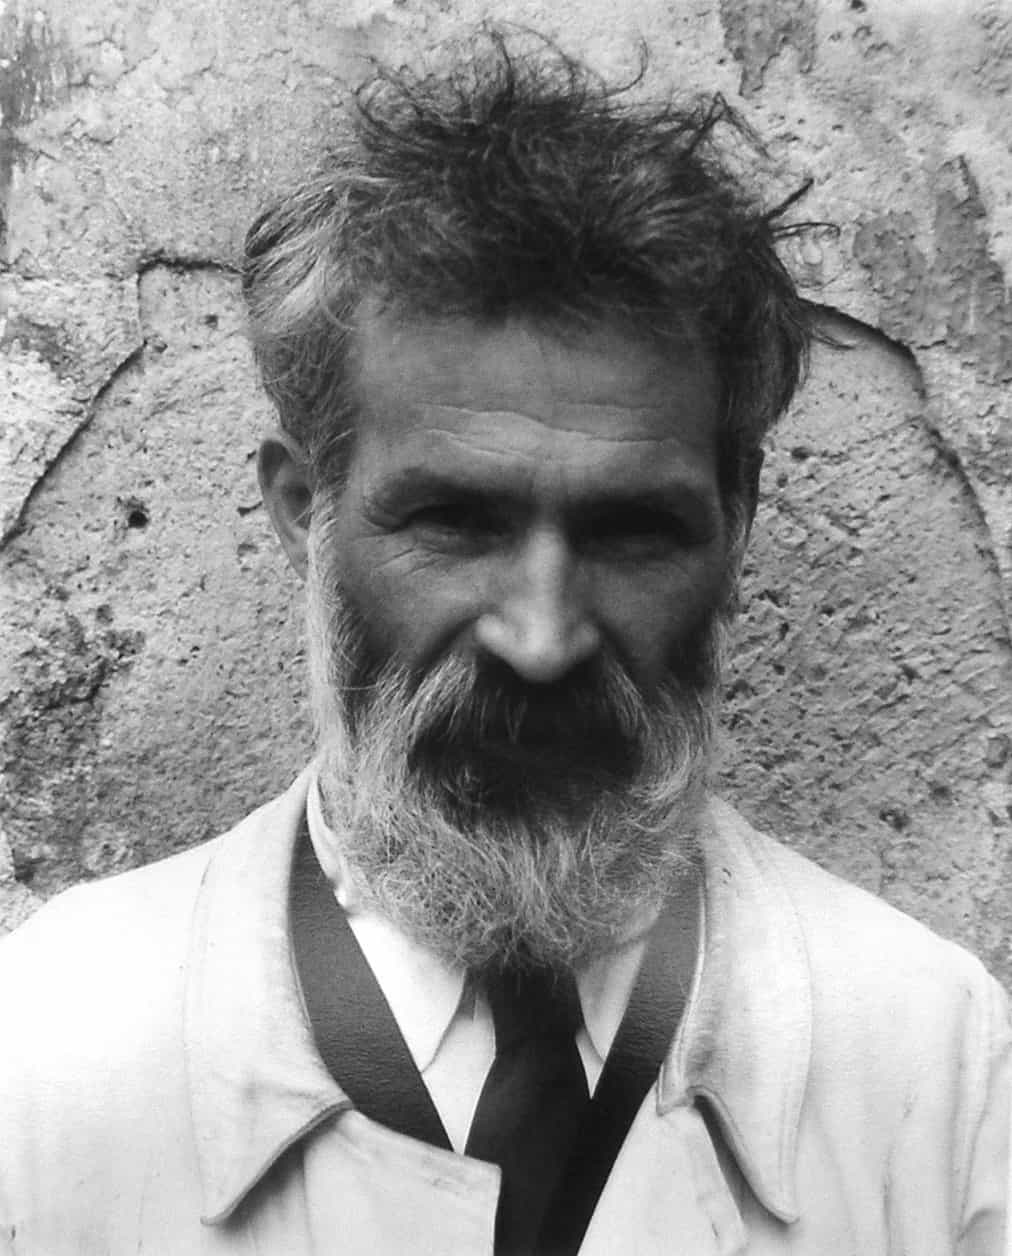 Constantin Brâncuși, Photograph taken by Edward Steichen in 1922